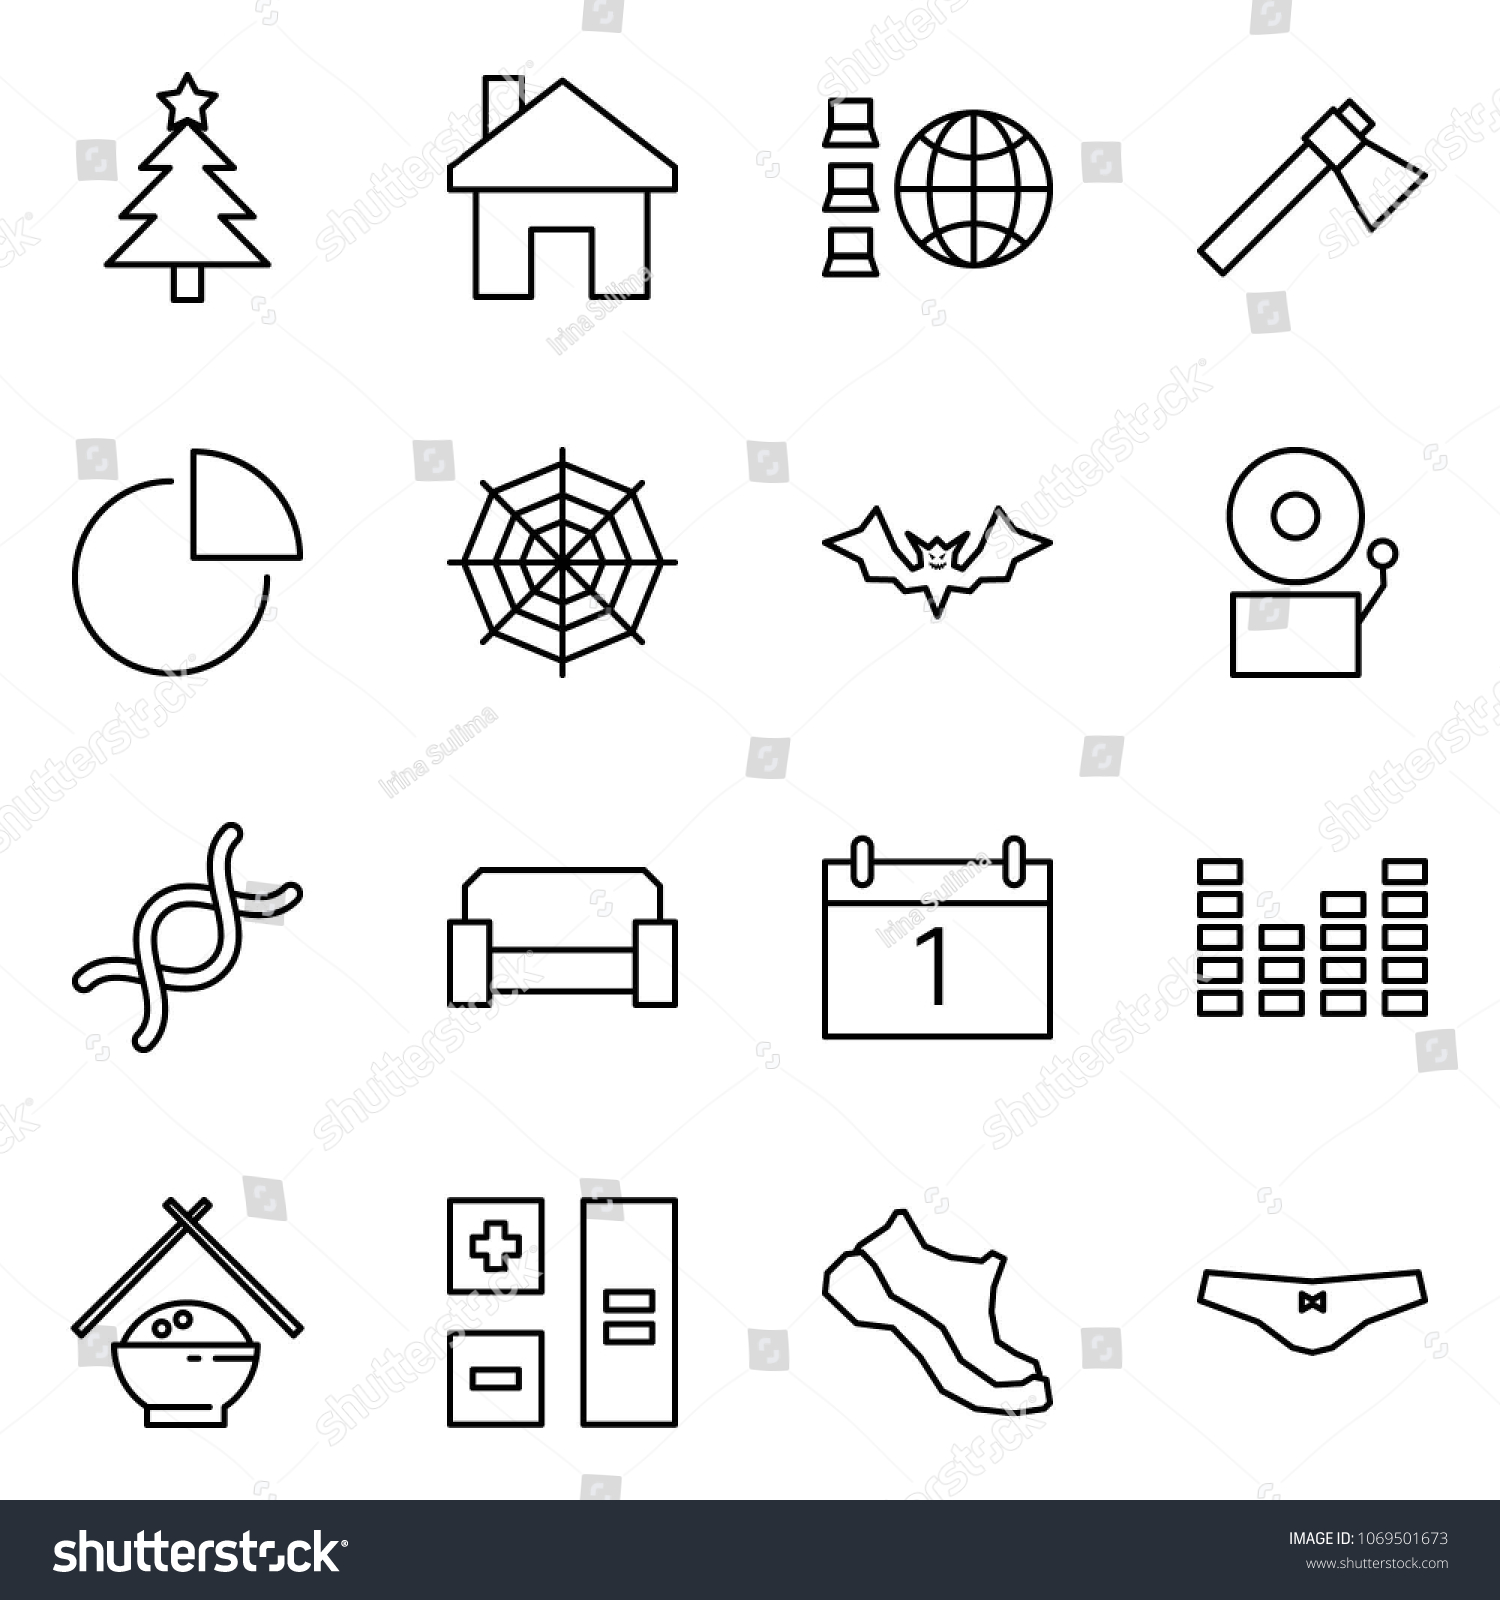 flat vector icon set - christmas tree vector, home, network, axe, diagram,  web, bat, bell, dna, sofa, calendar, equalizer, rice, calculator, sneakers,